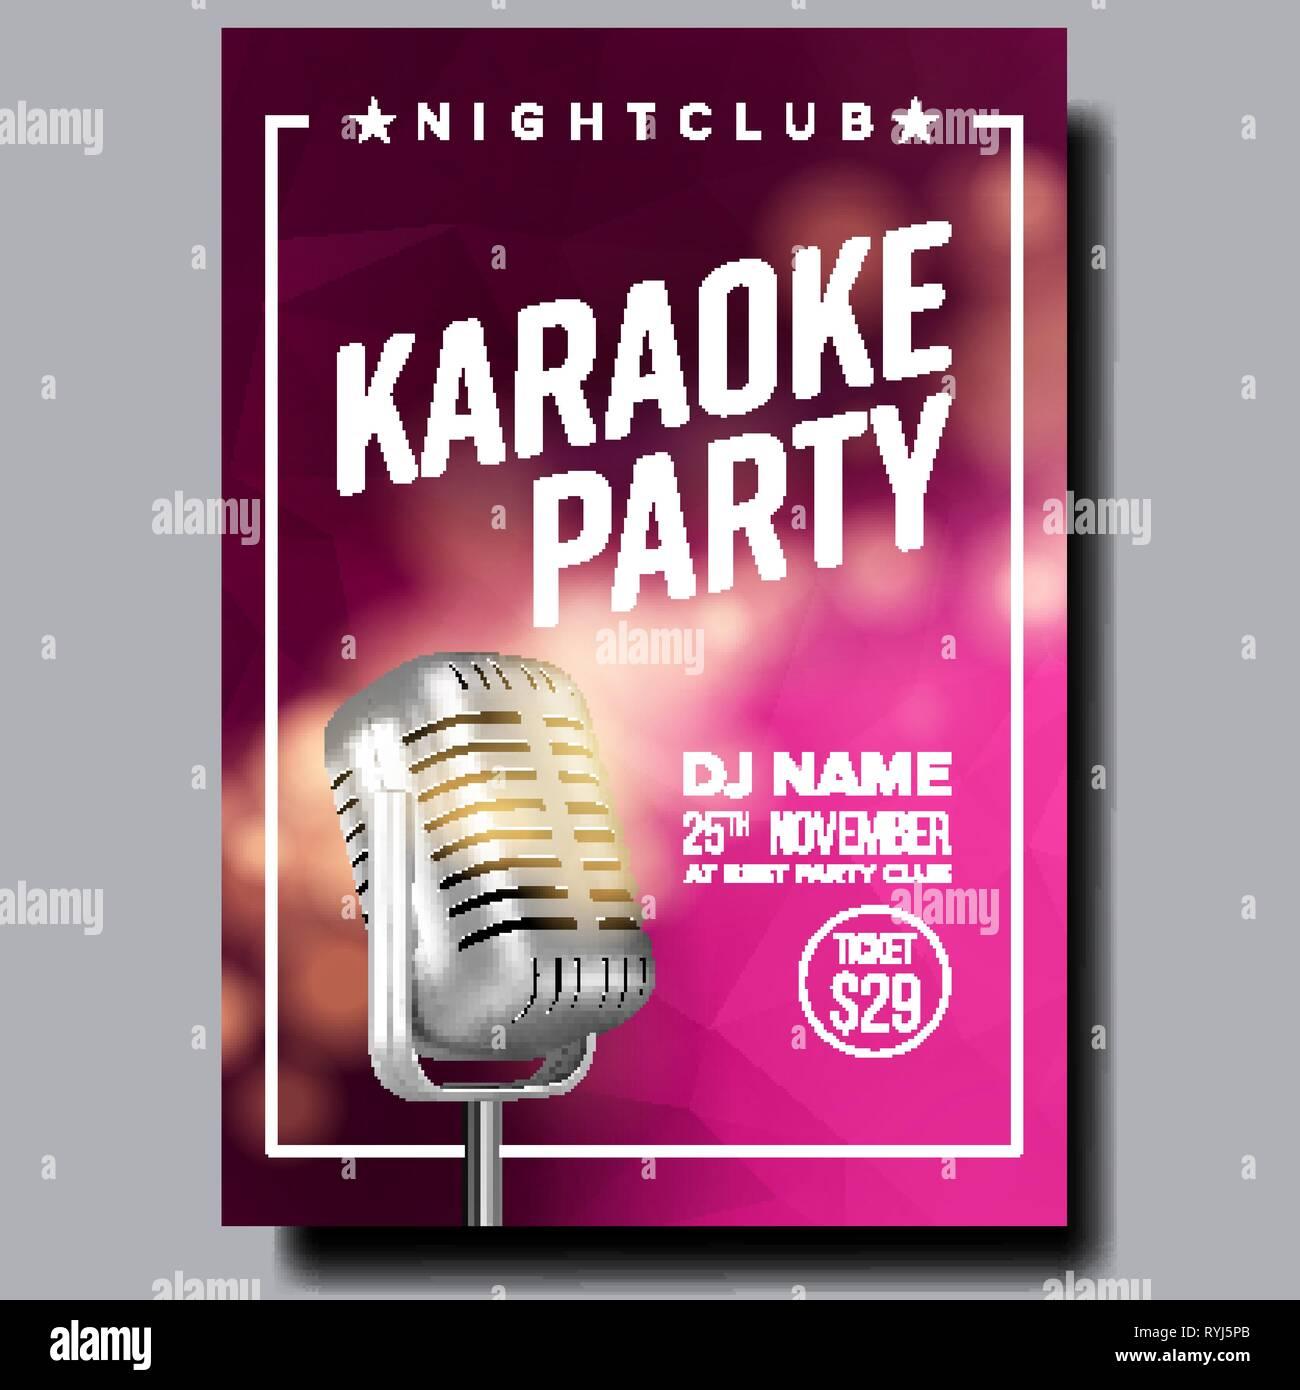 Karaoke Poster Vector. Party Flyer. Karaoke Music Night. Radio Microphone. Abstract Template. Rock Fun. Vocal Sign. Old Bar. Star Show. Modern Sound - Stock Vector